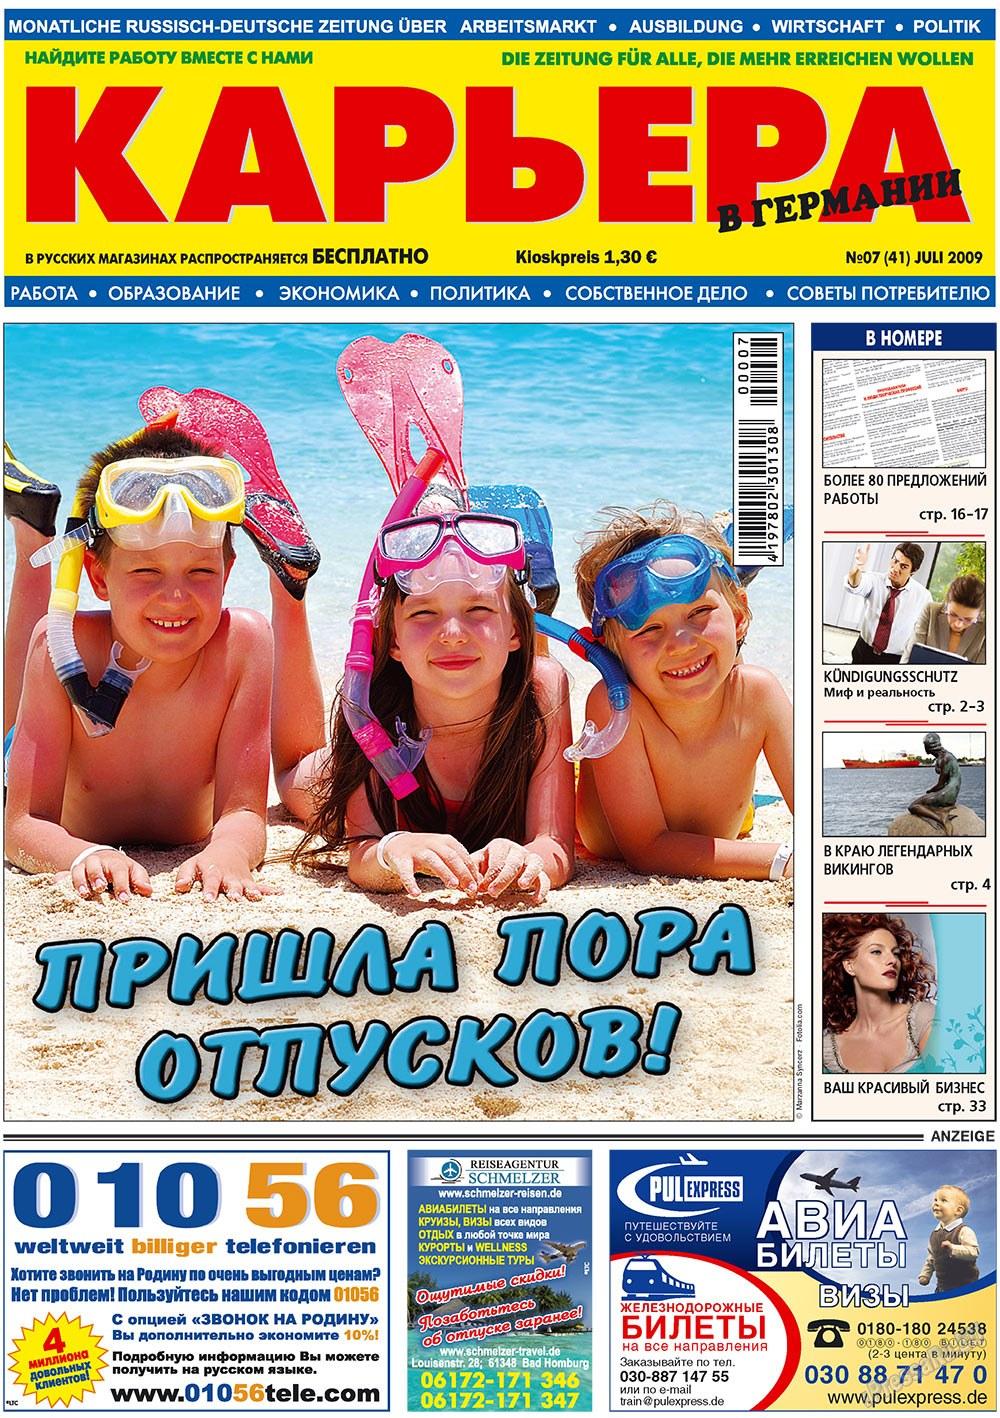 Карьера (газета). 2009 год, номер 7, стр. 1